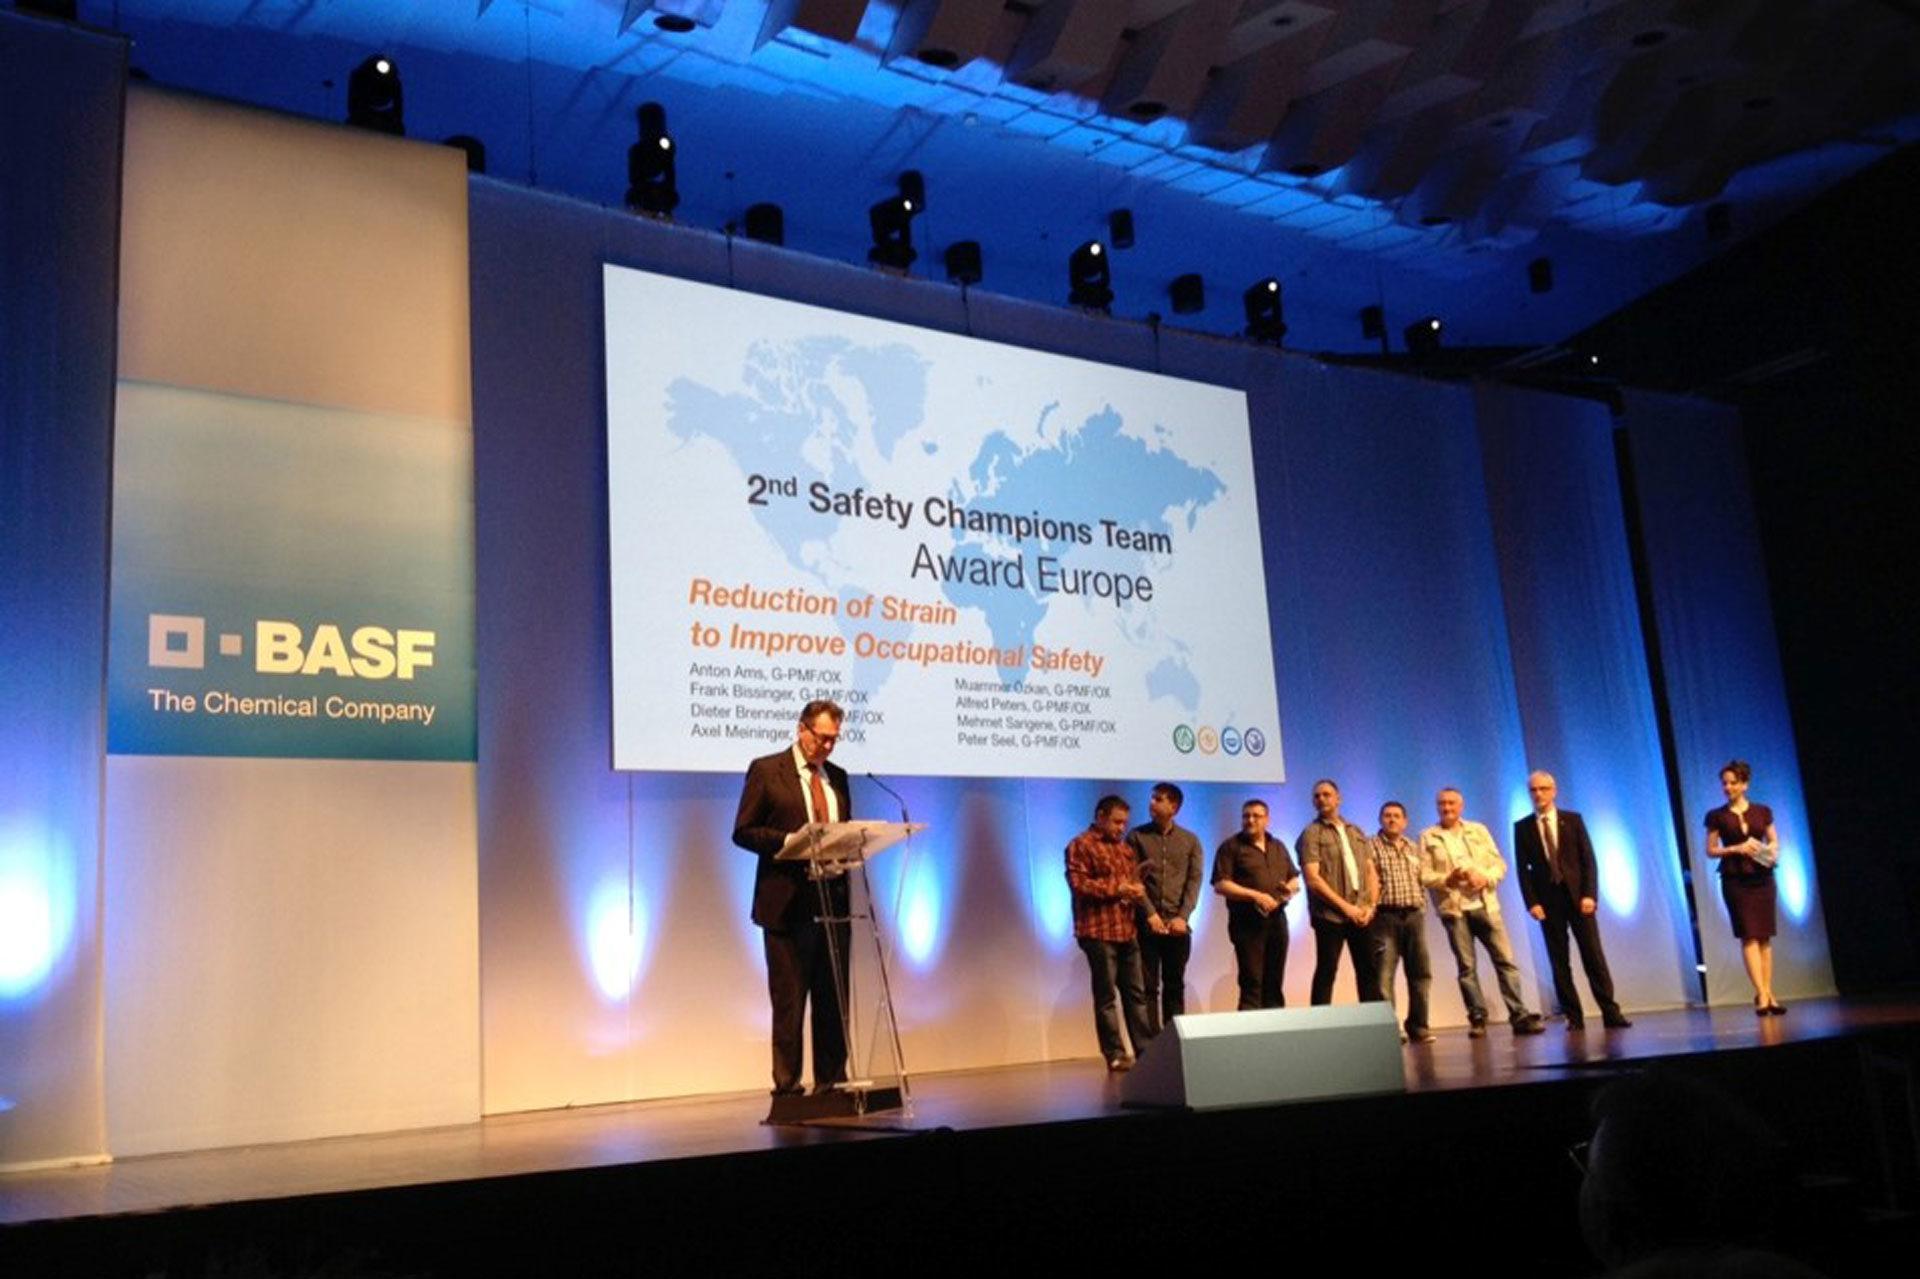 Agentur Ressmann Mannheim BASF 2nd Safety Champions Team Award Europe